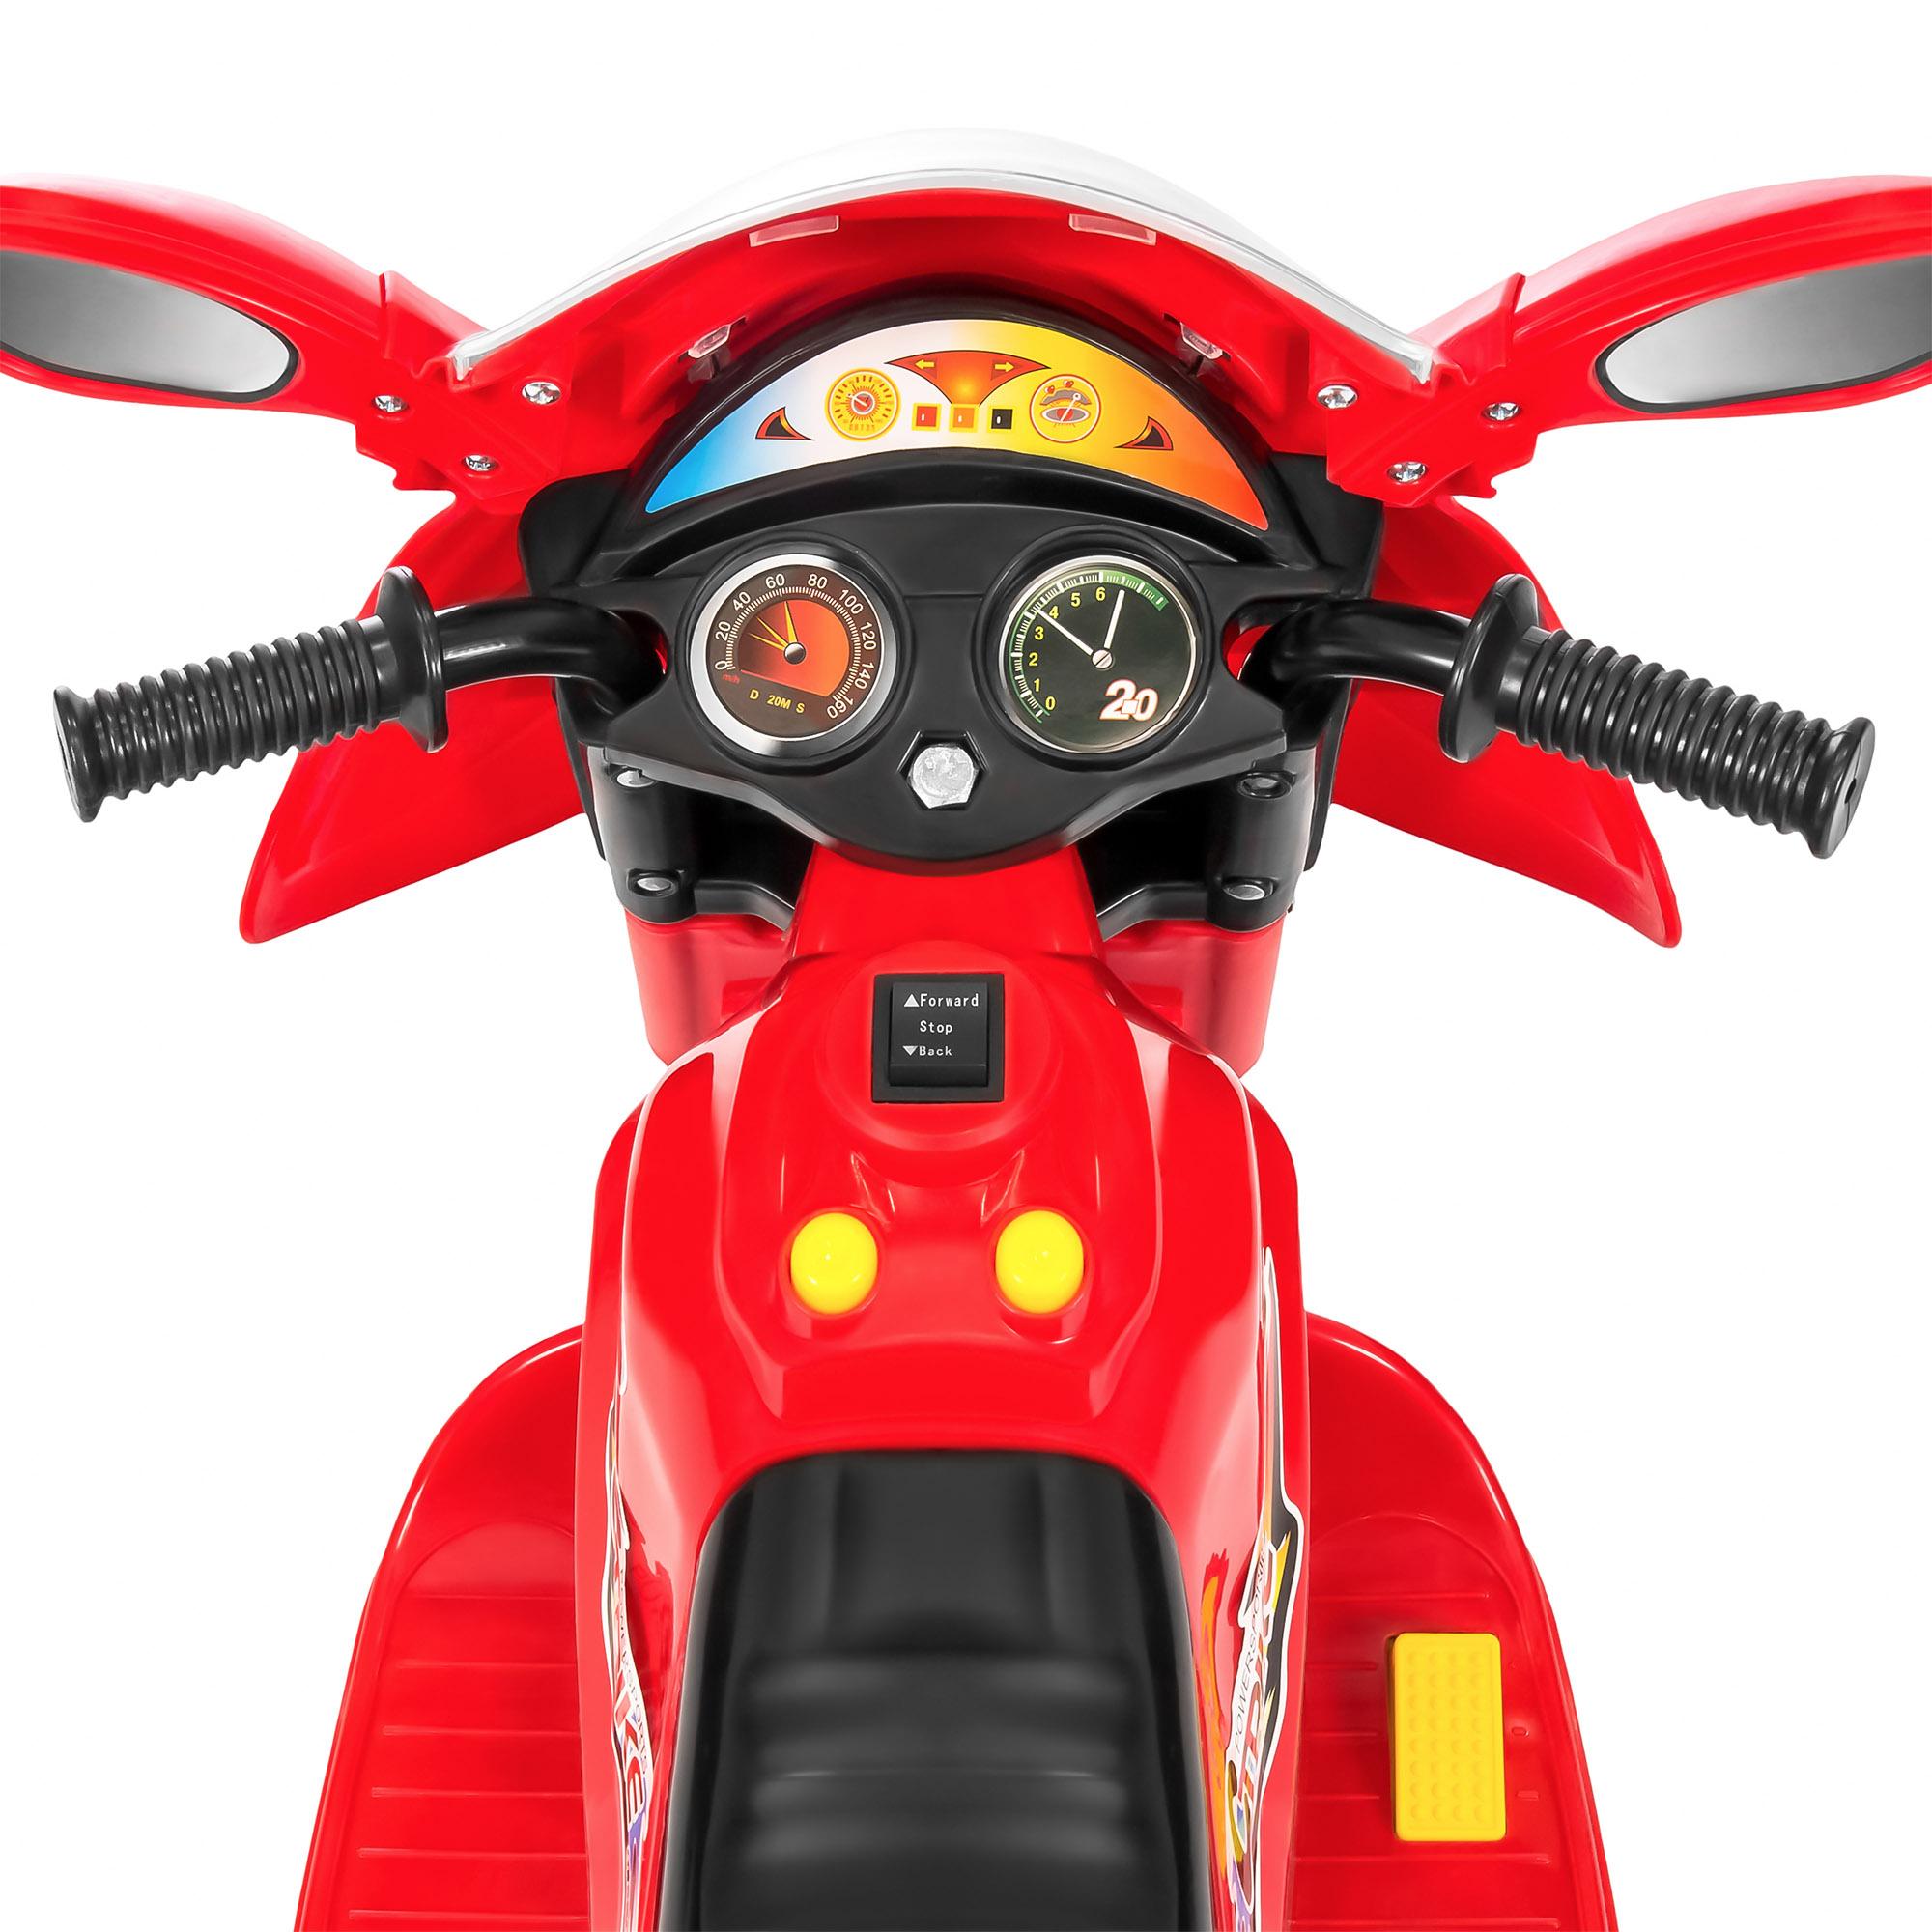 BCP-6V-Kids-3-Wheel-Motorcycle-Ride-On-Toy-w-LED-Lights-Music-Storage thumbnail 34